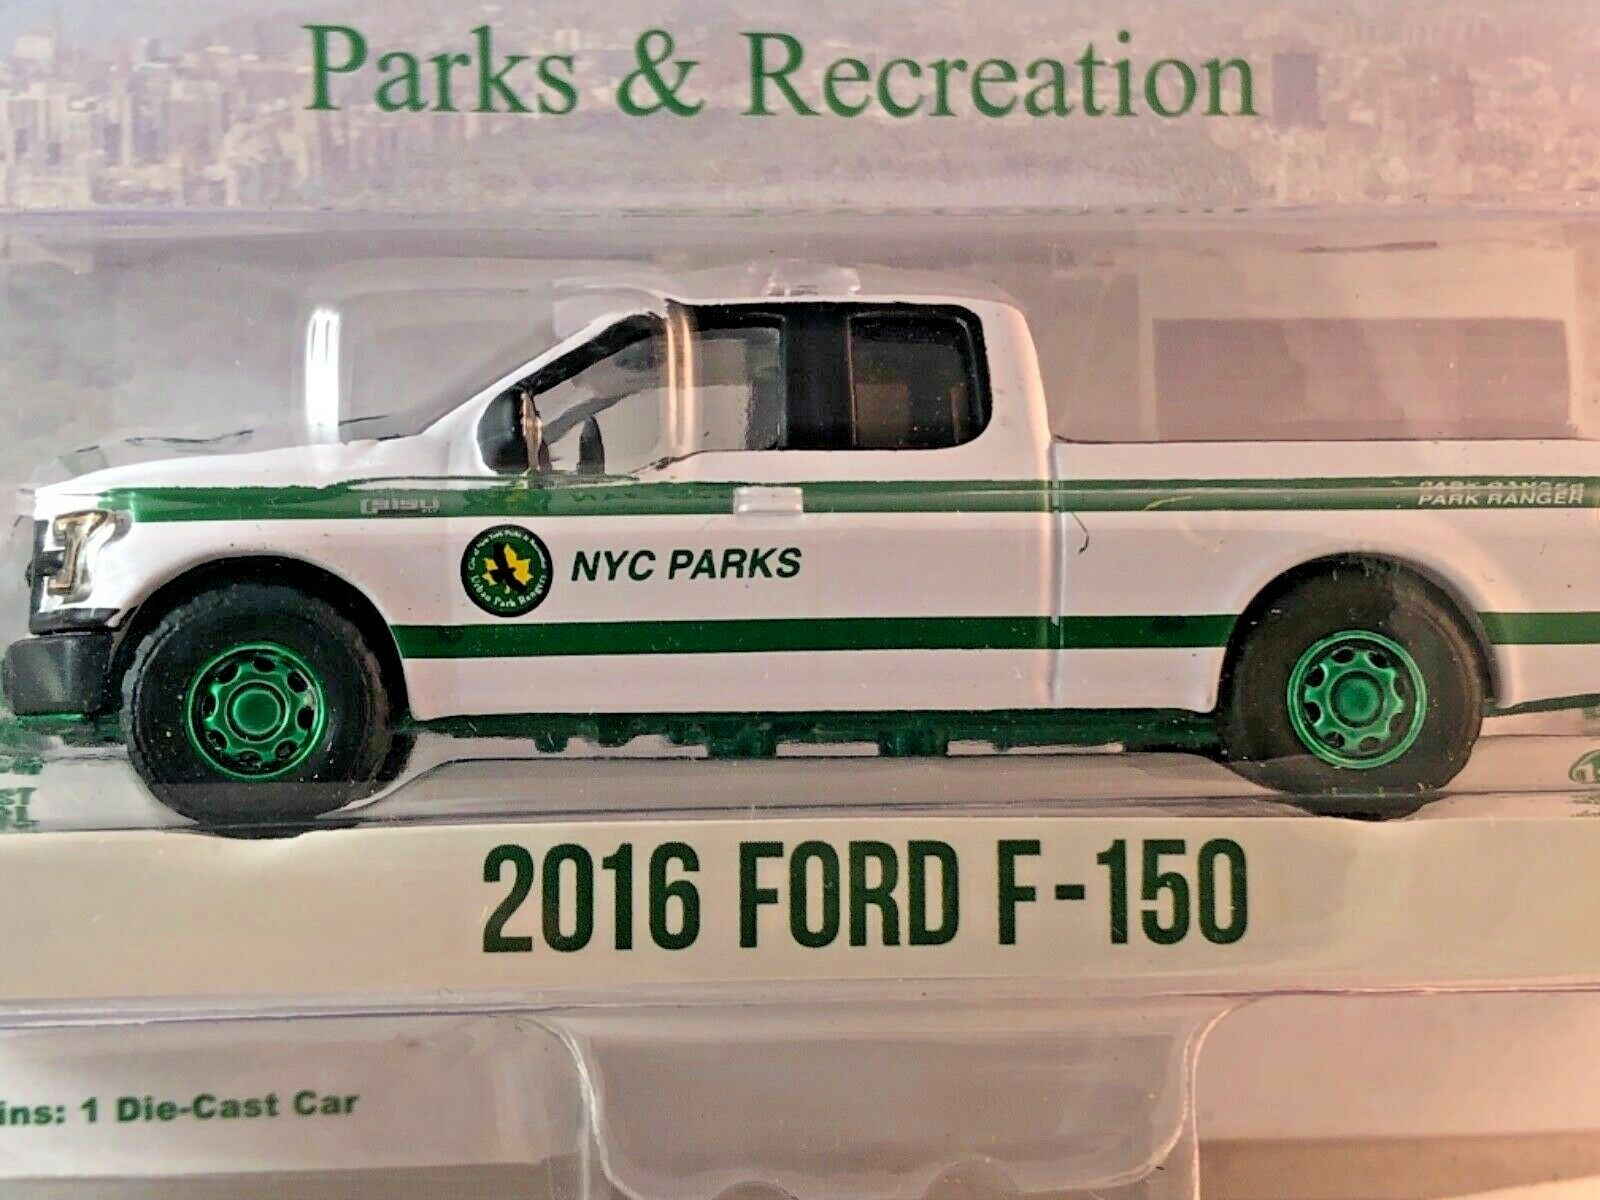 Máquina verde verdeLight Raro Chase Chase Chase 35100-E ciudad de Nueva York 2016 Ford F-150 688ff2